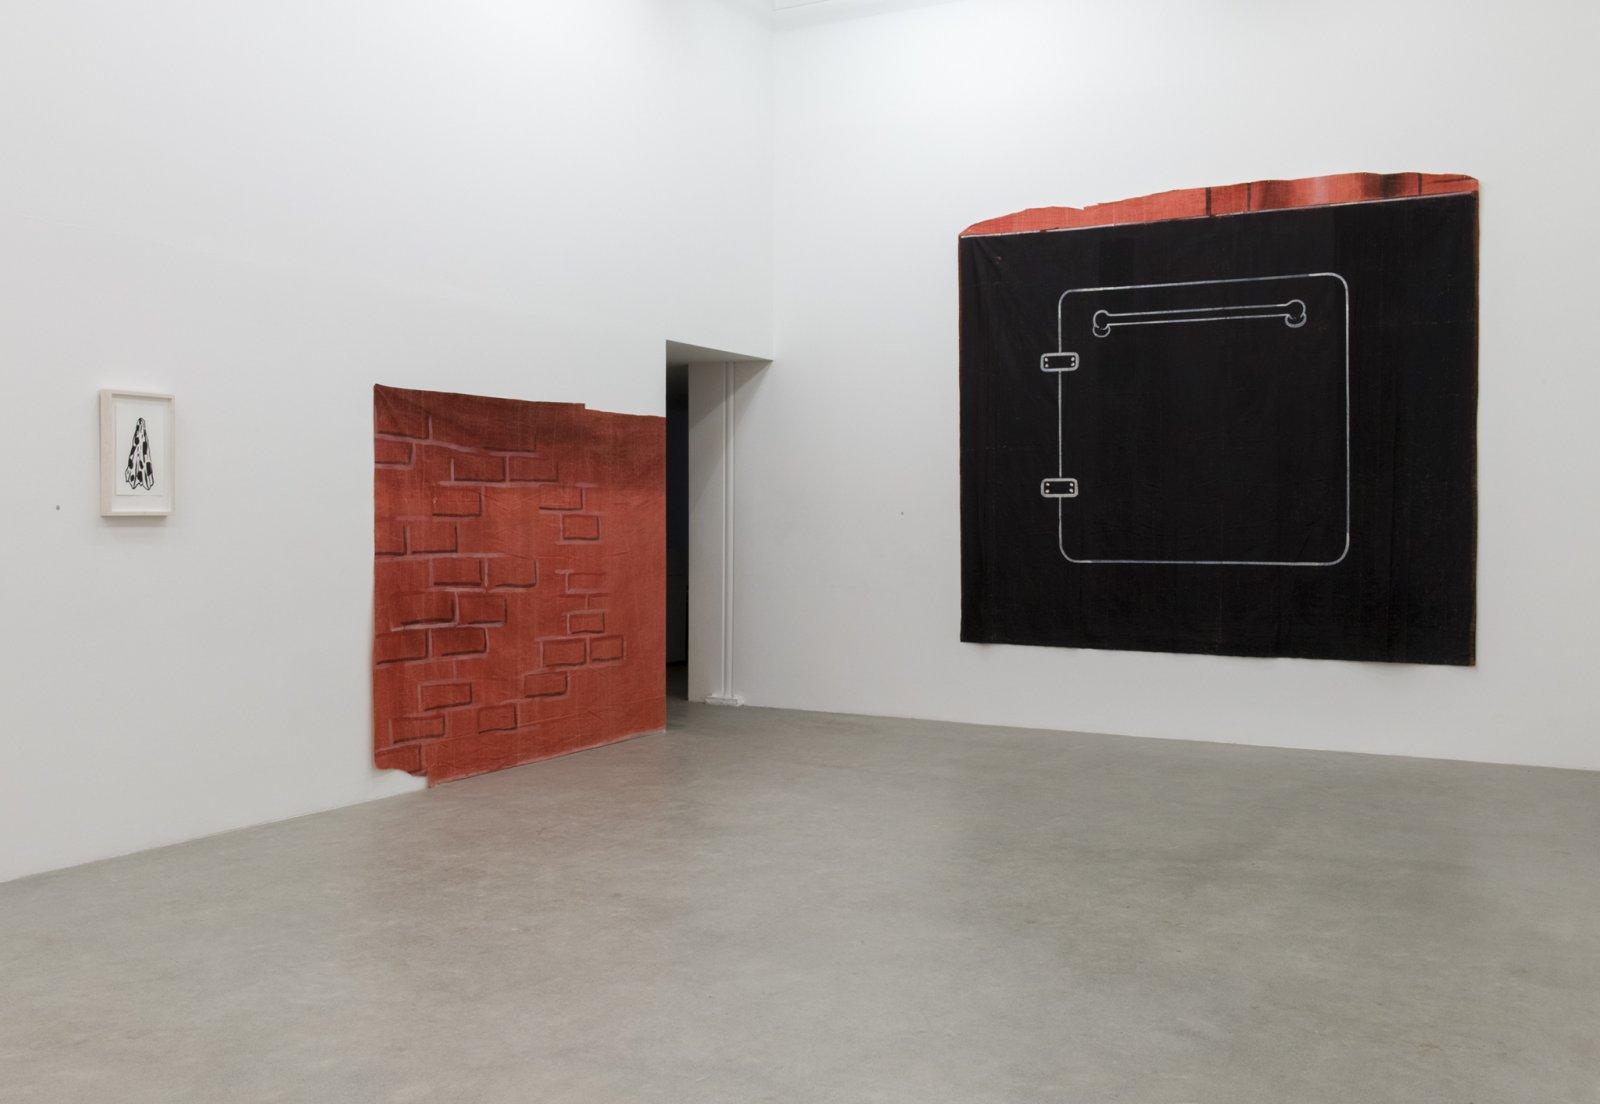 Geoffrey Farmer, installation view, The Big Kitchen, Catriona Jeffries, 2017 by Geoffrey Farmer